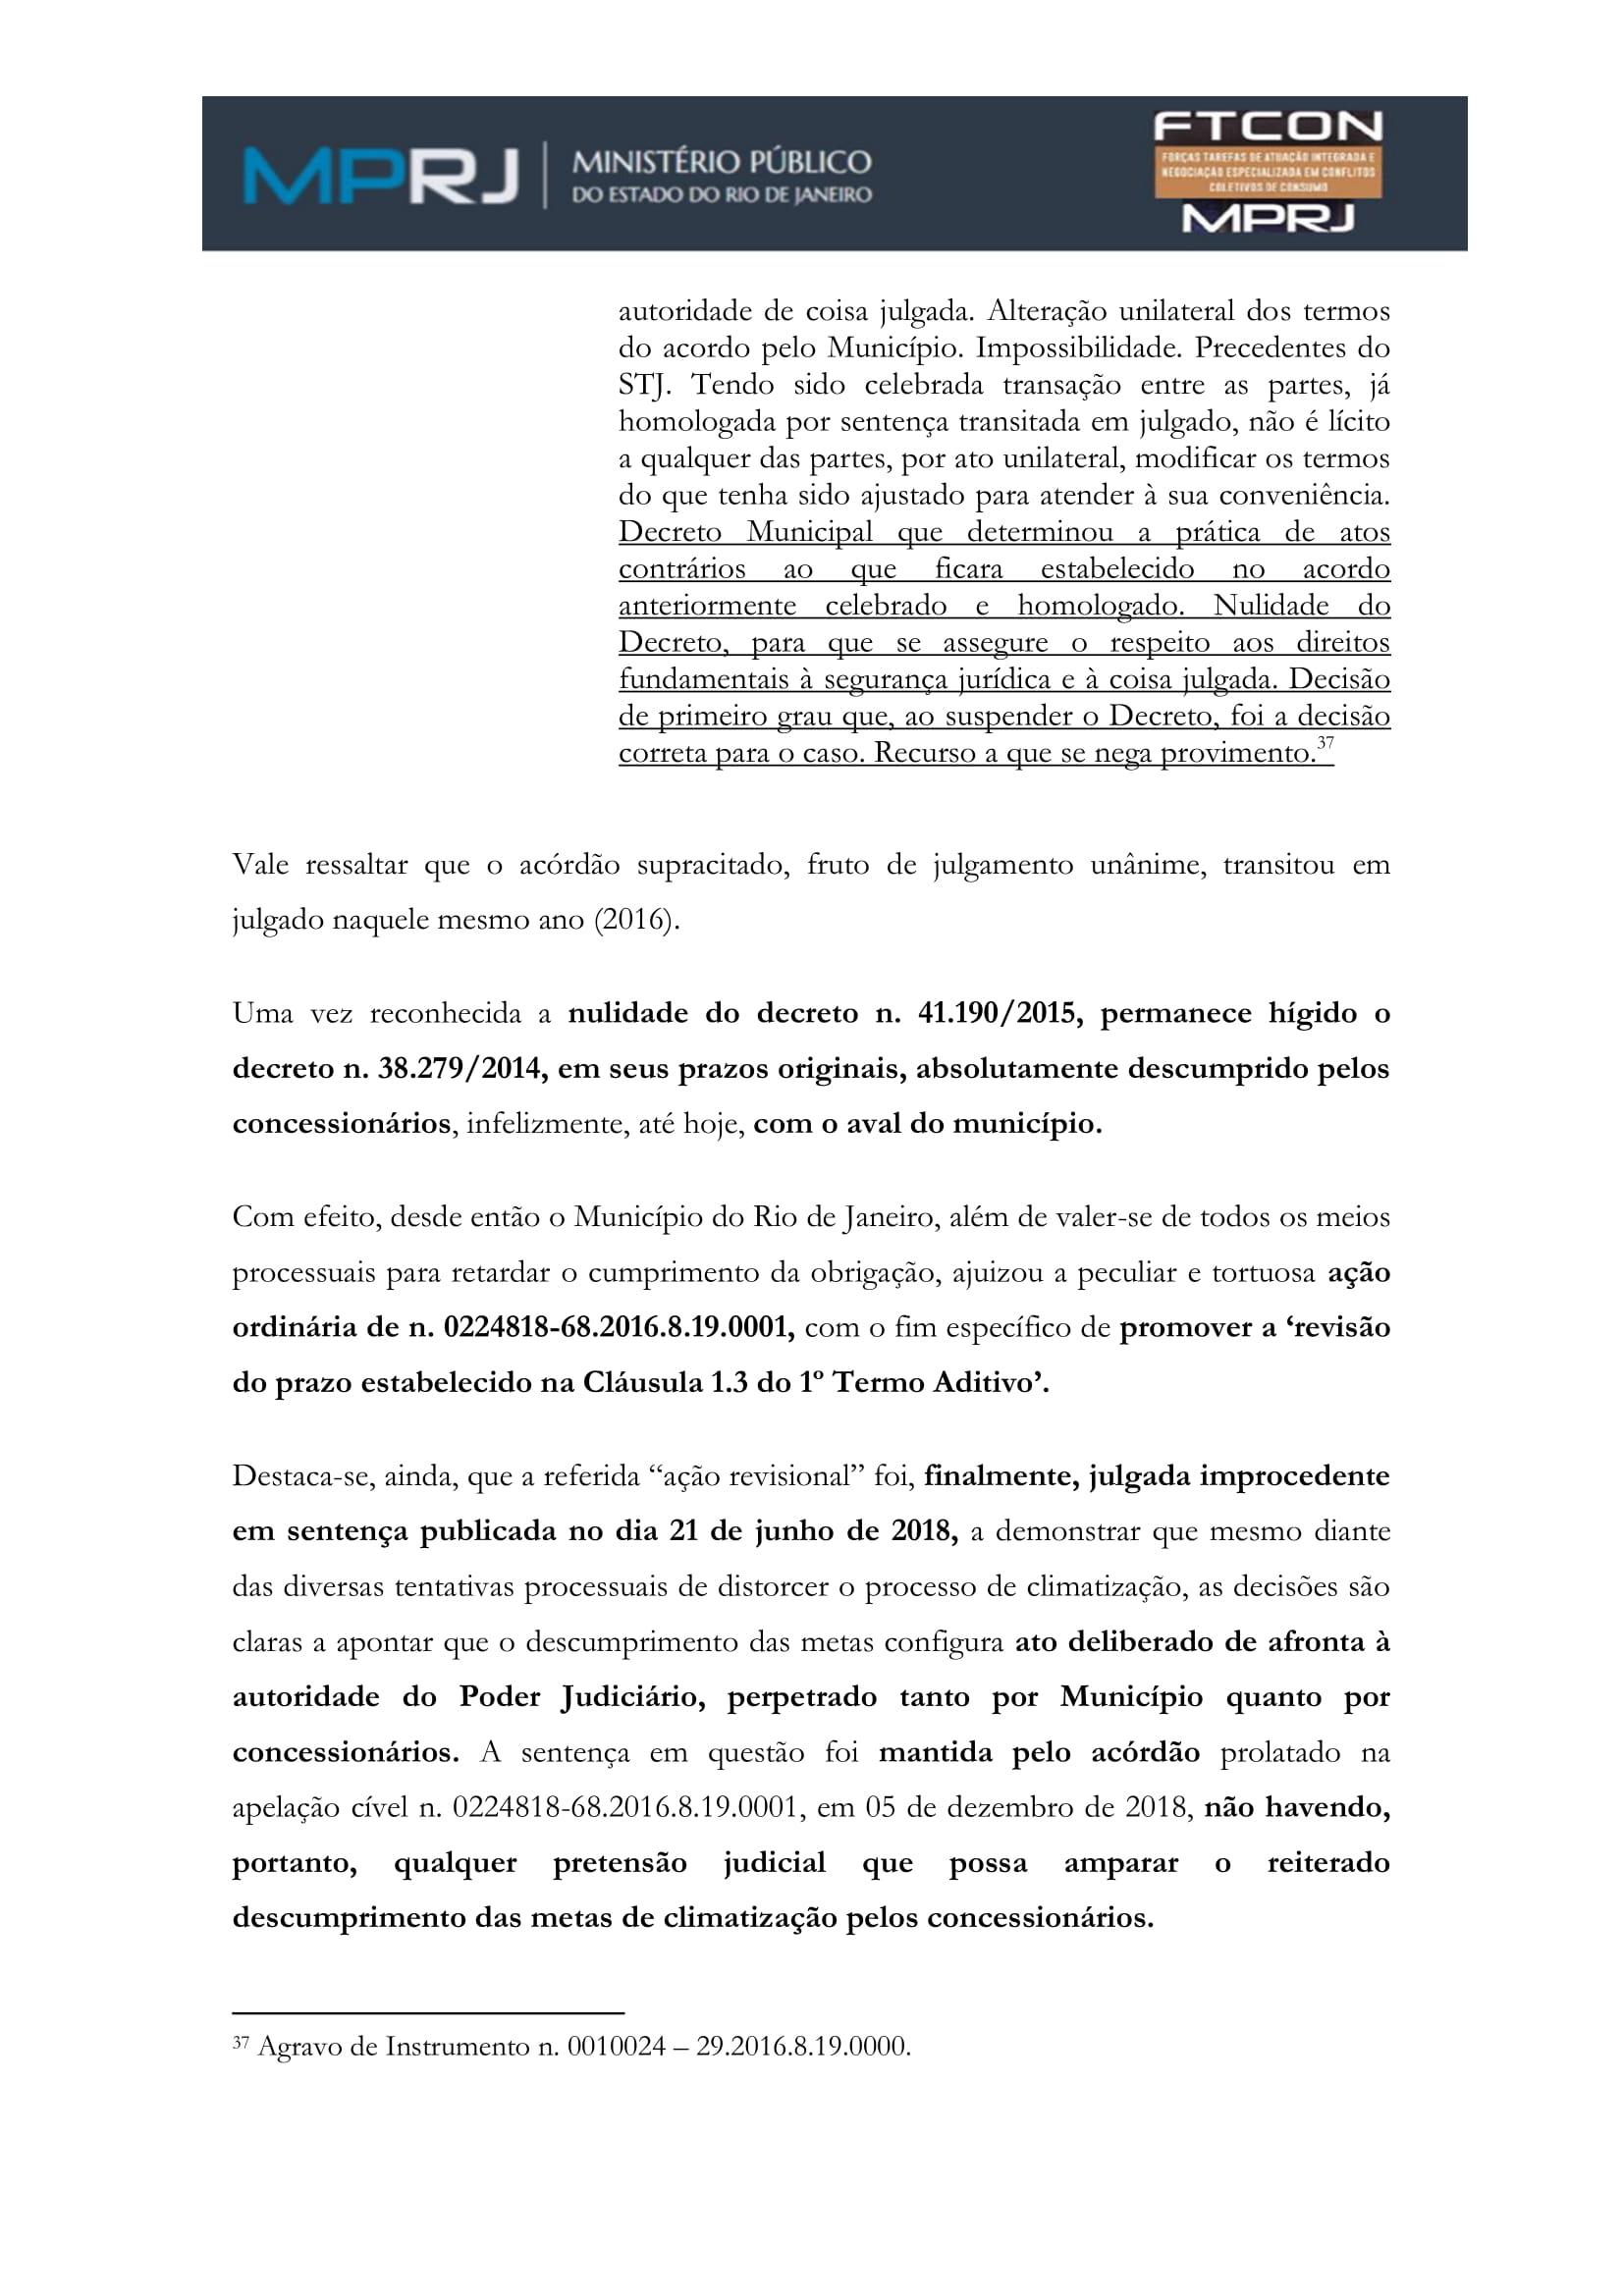 acp_caducidade_onibus_dr_rt-041